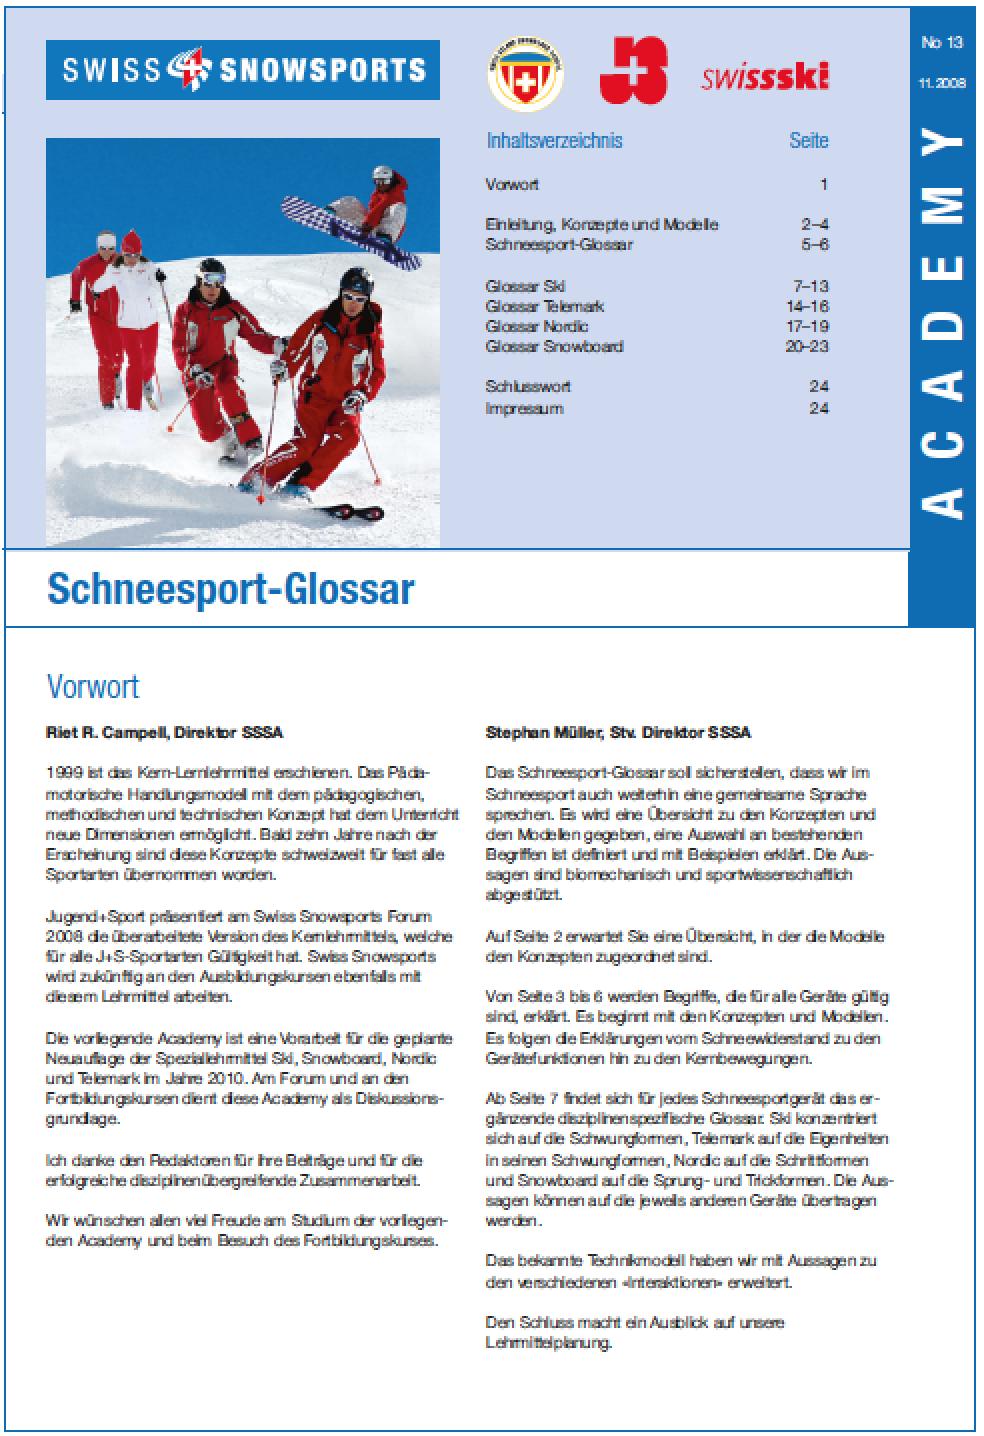 Preview image for LOM object Kernbewegungen im Schneesport